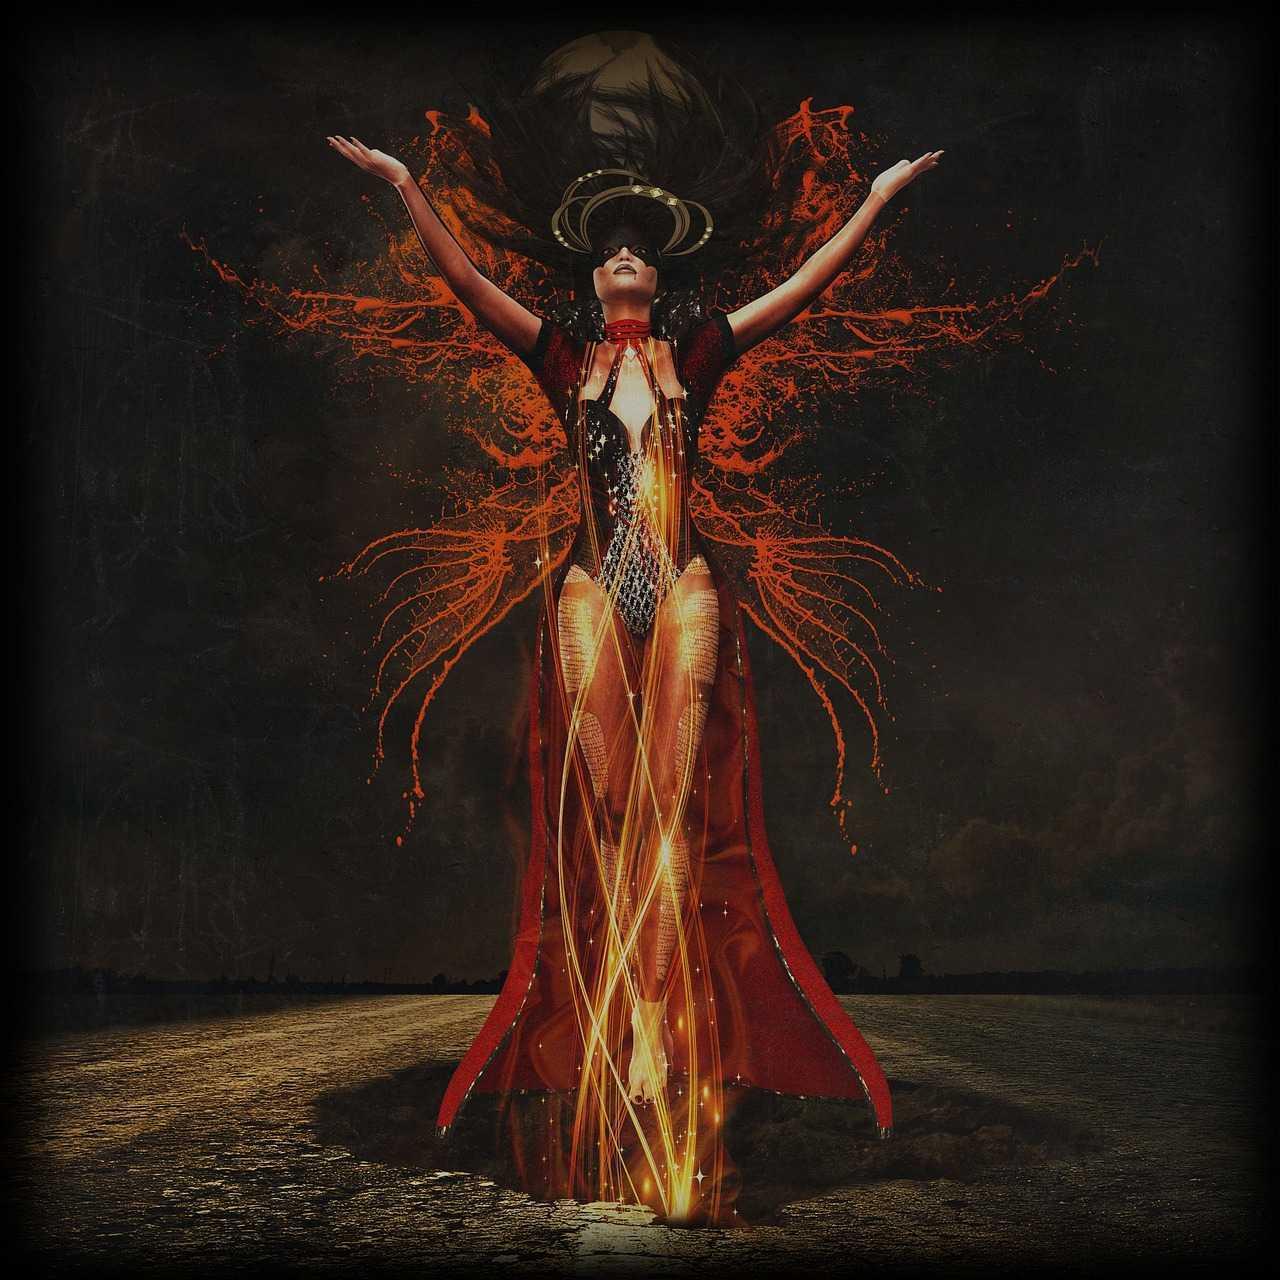 Female Demon Lilith: Sigil & Invocation of Primal Femininity